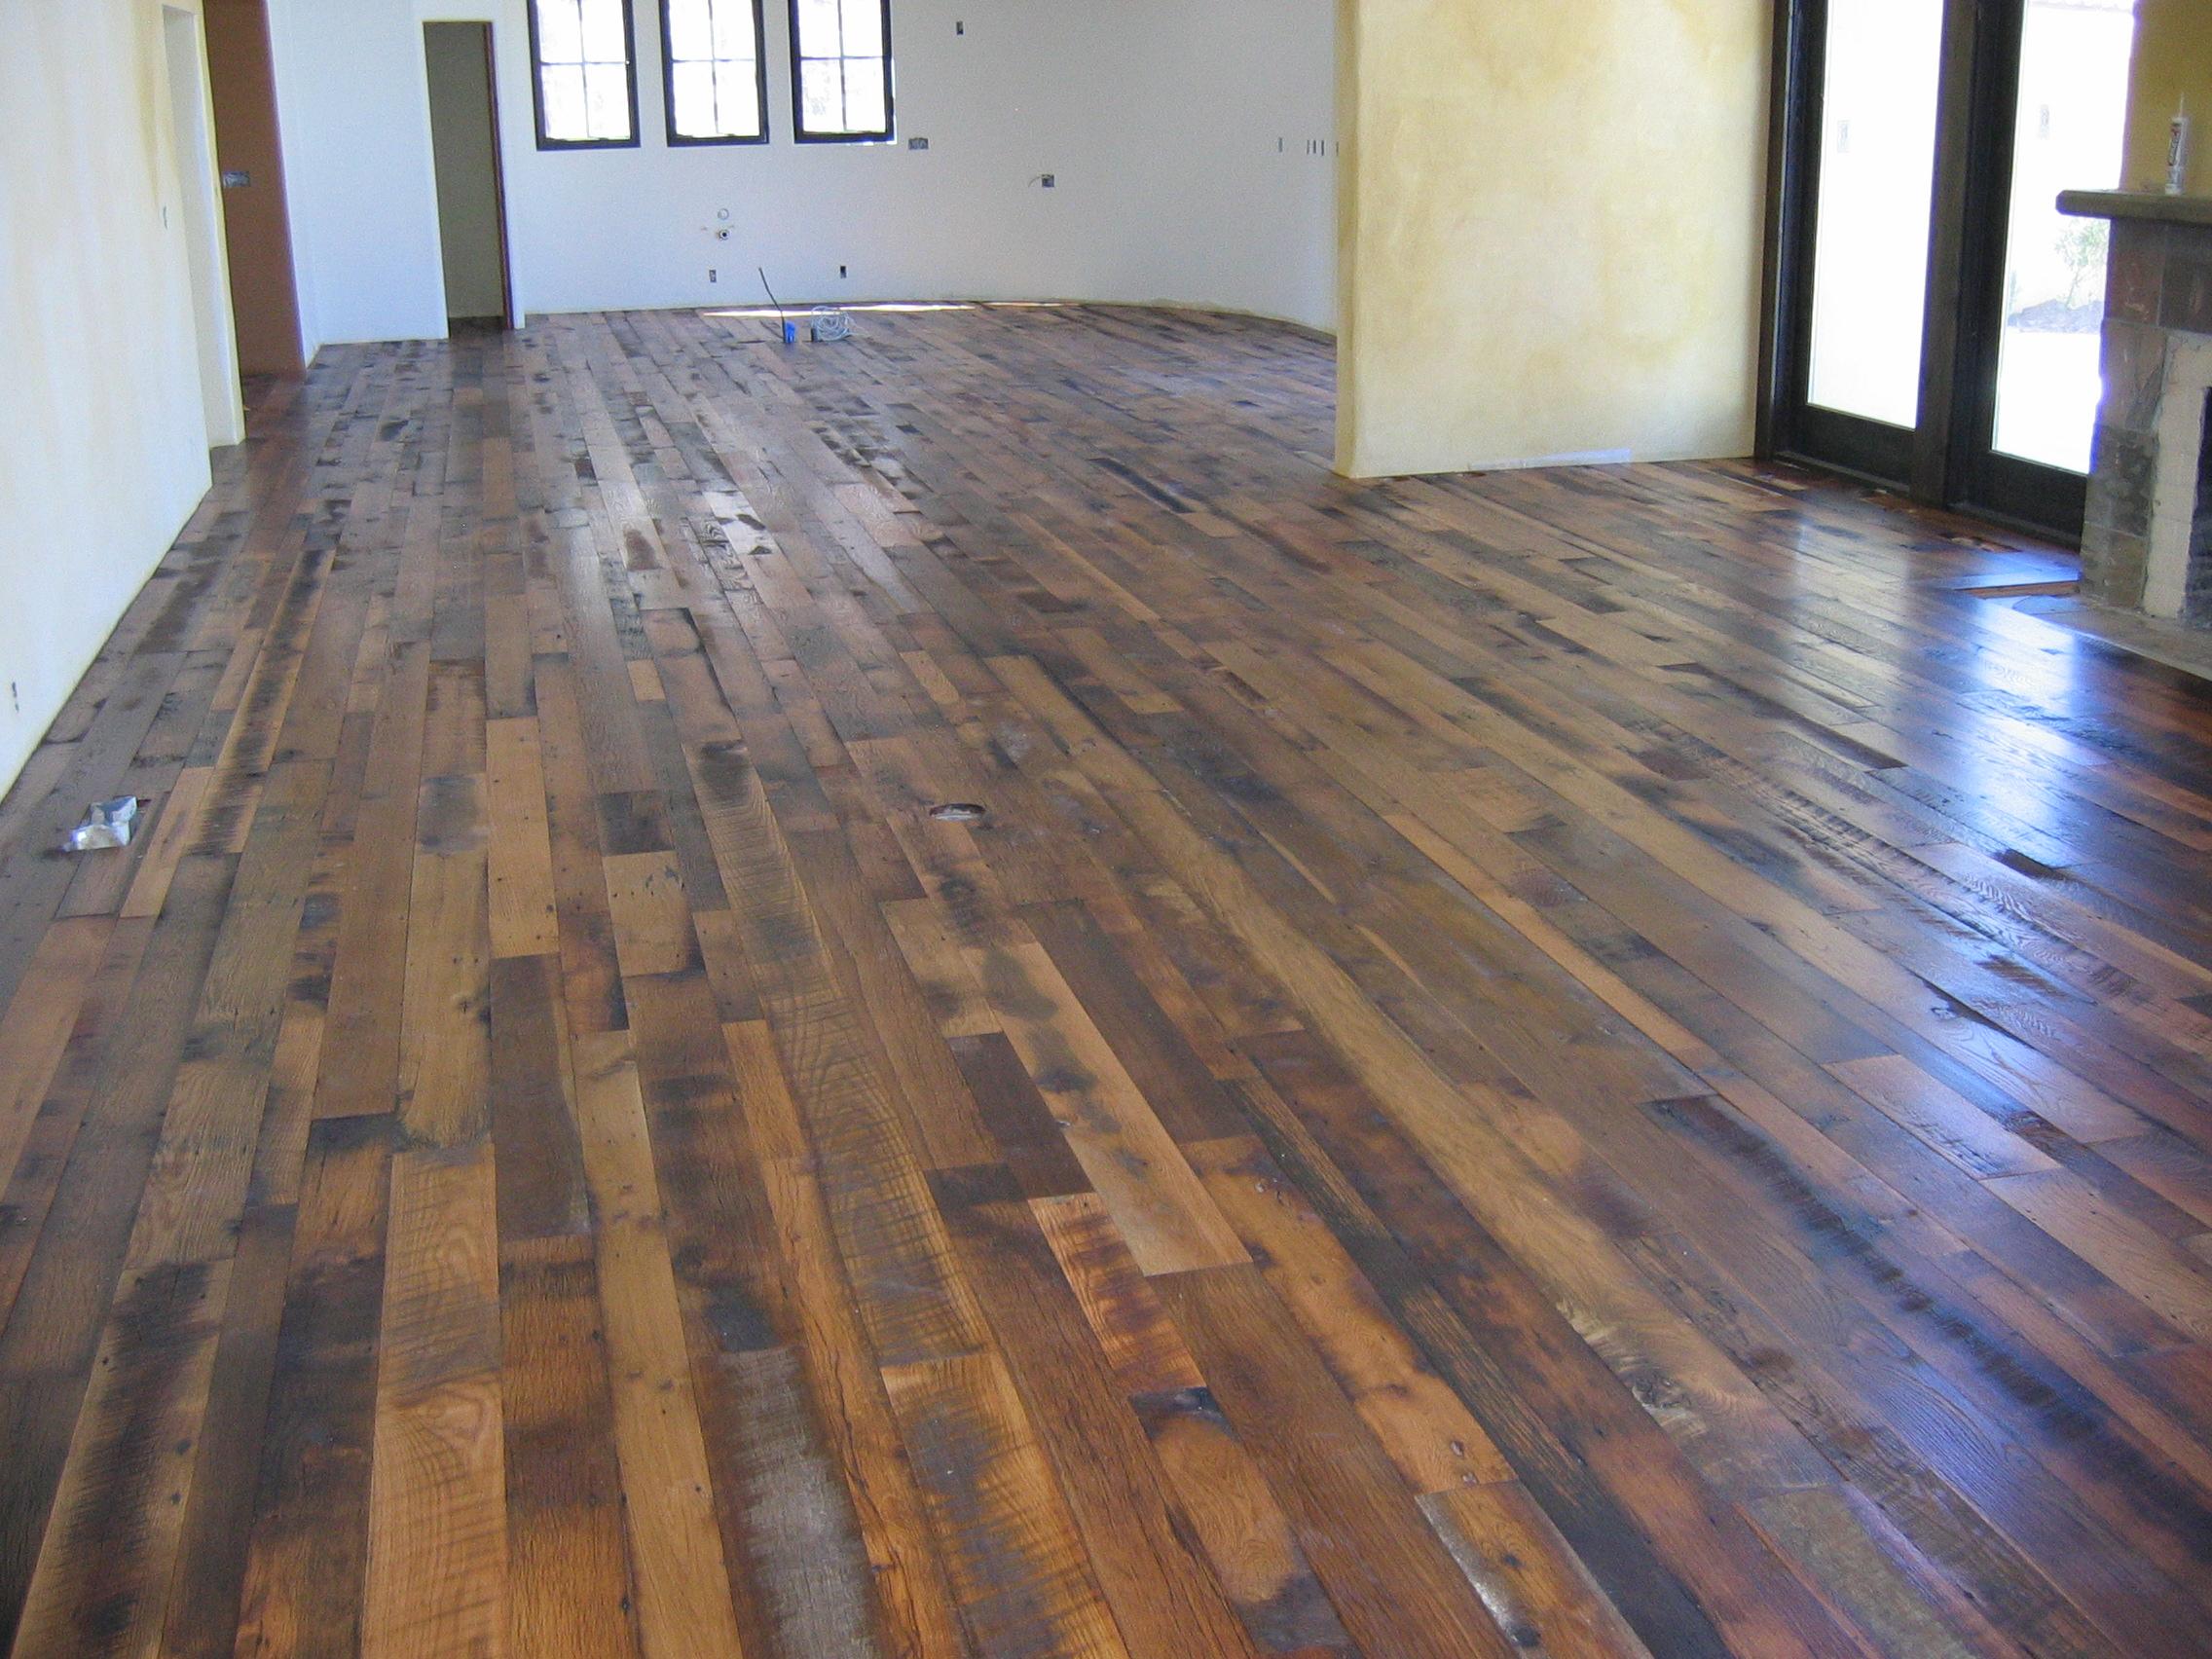 Distressed Wood Flooring Exotic Flooring Idea to Add